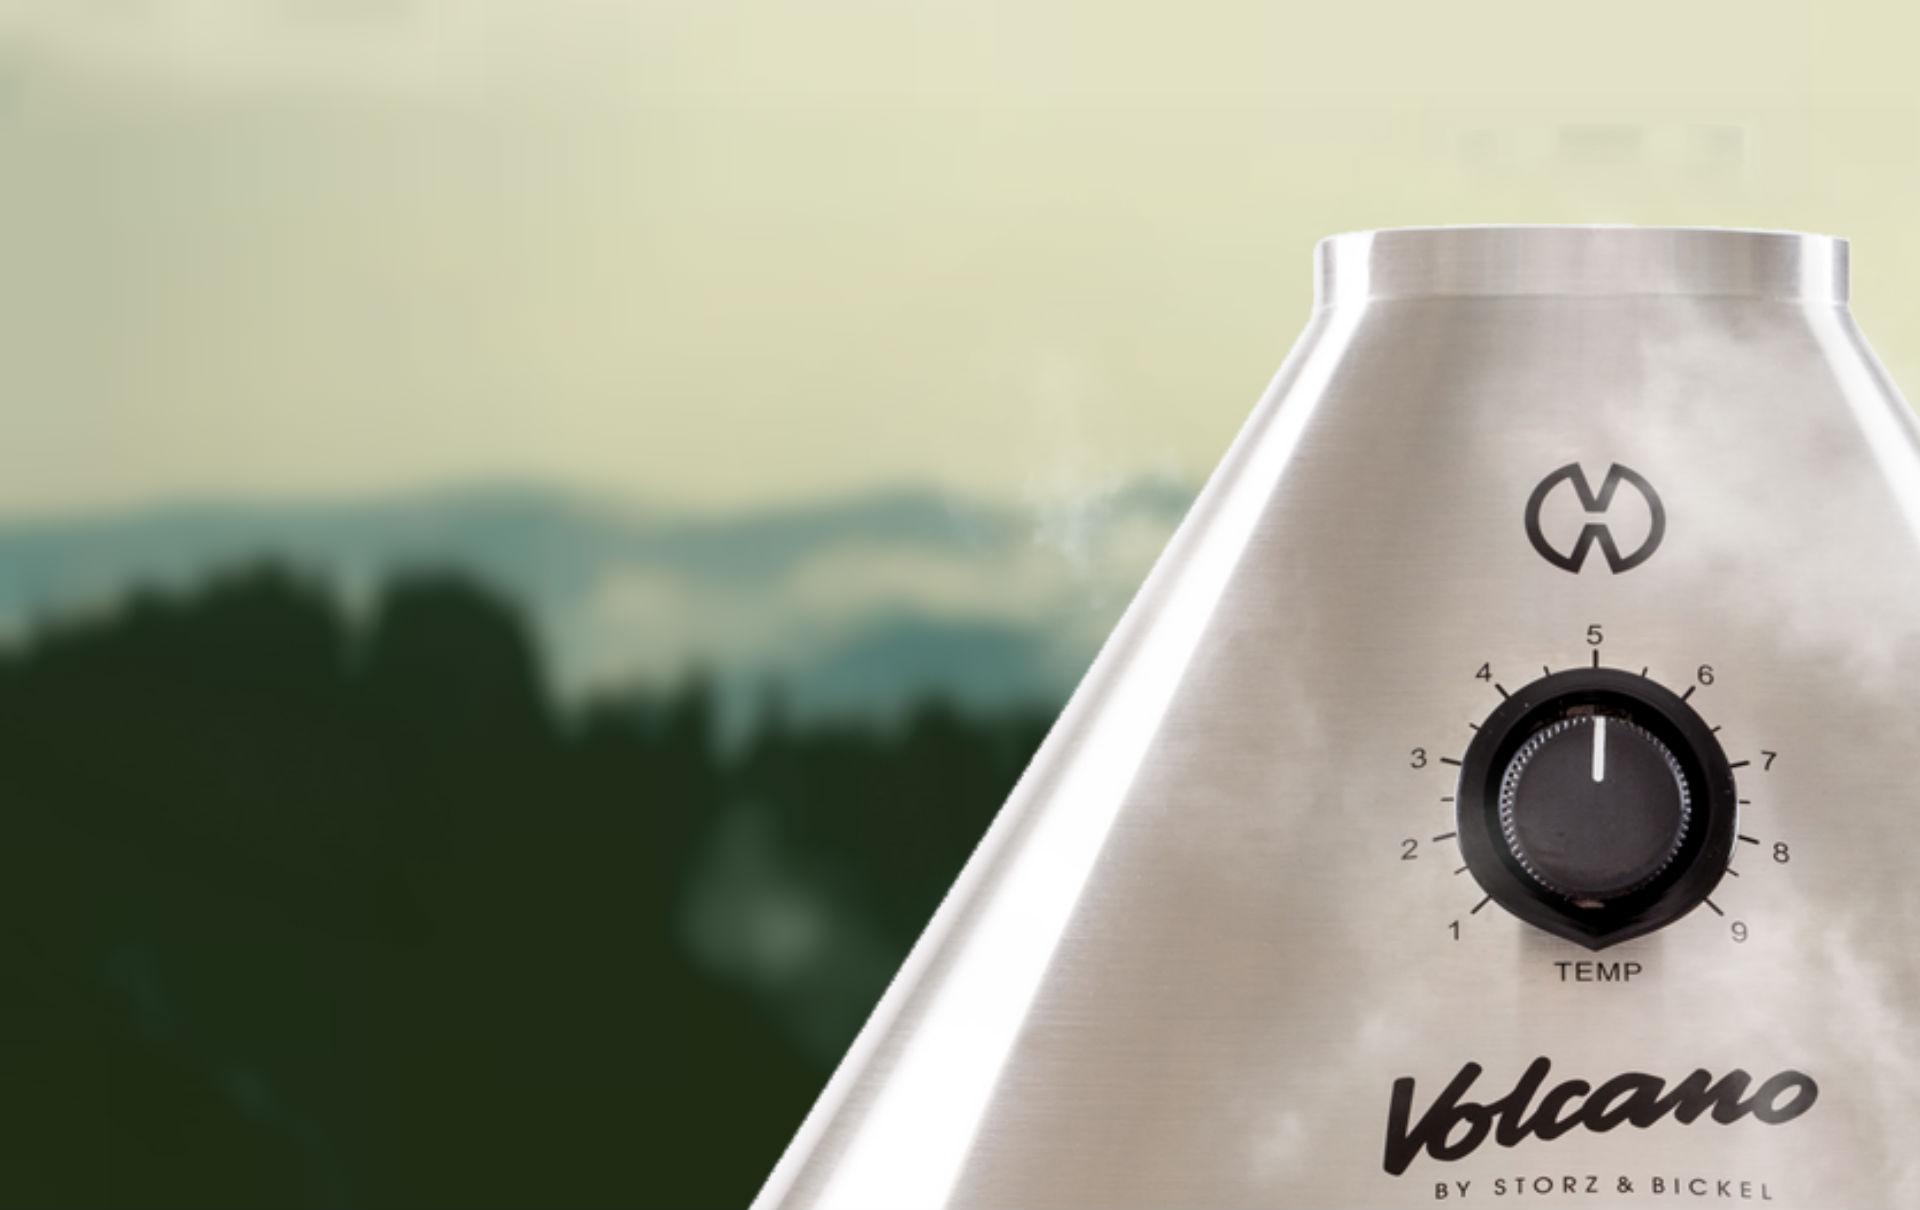 Volcano Table Vape - Principlesofafreesociety